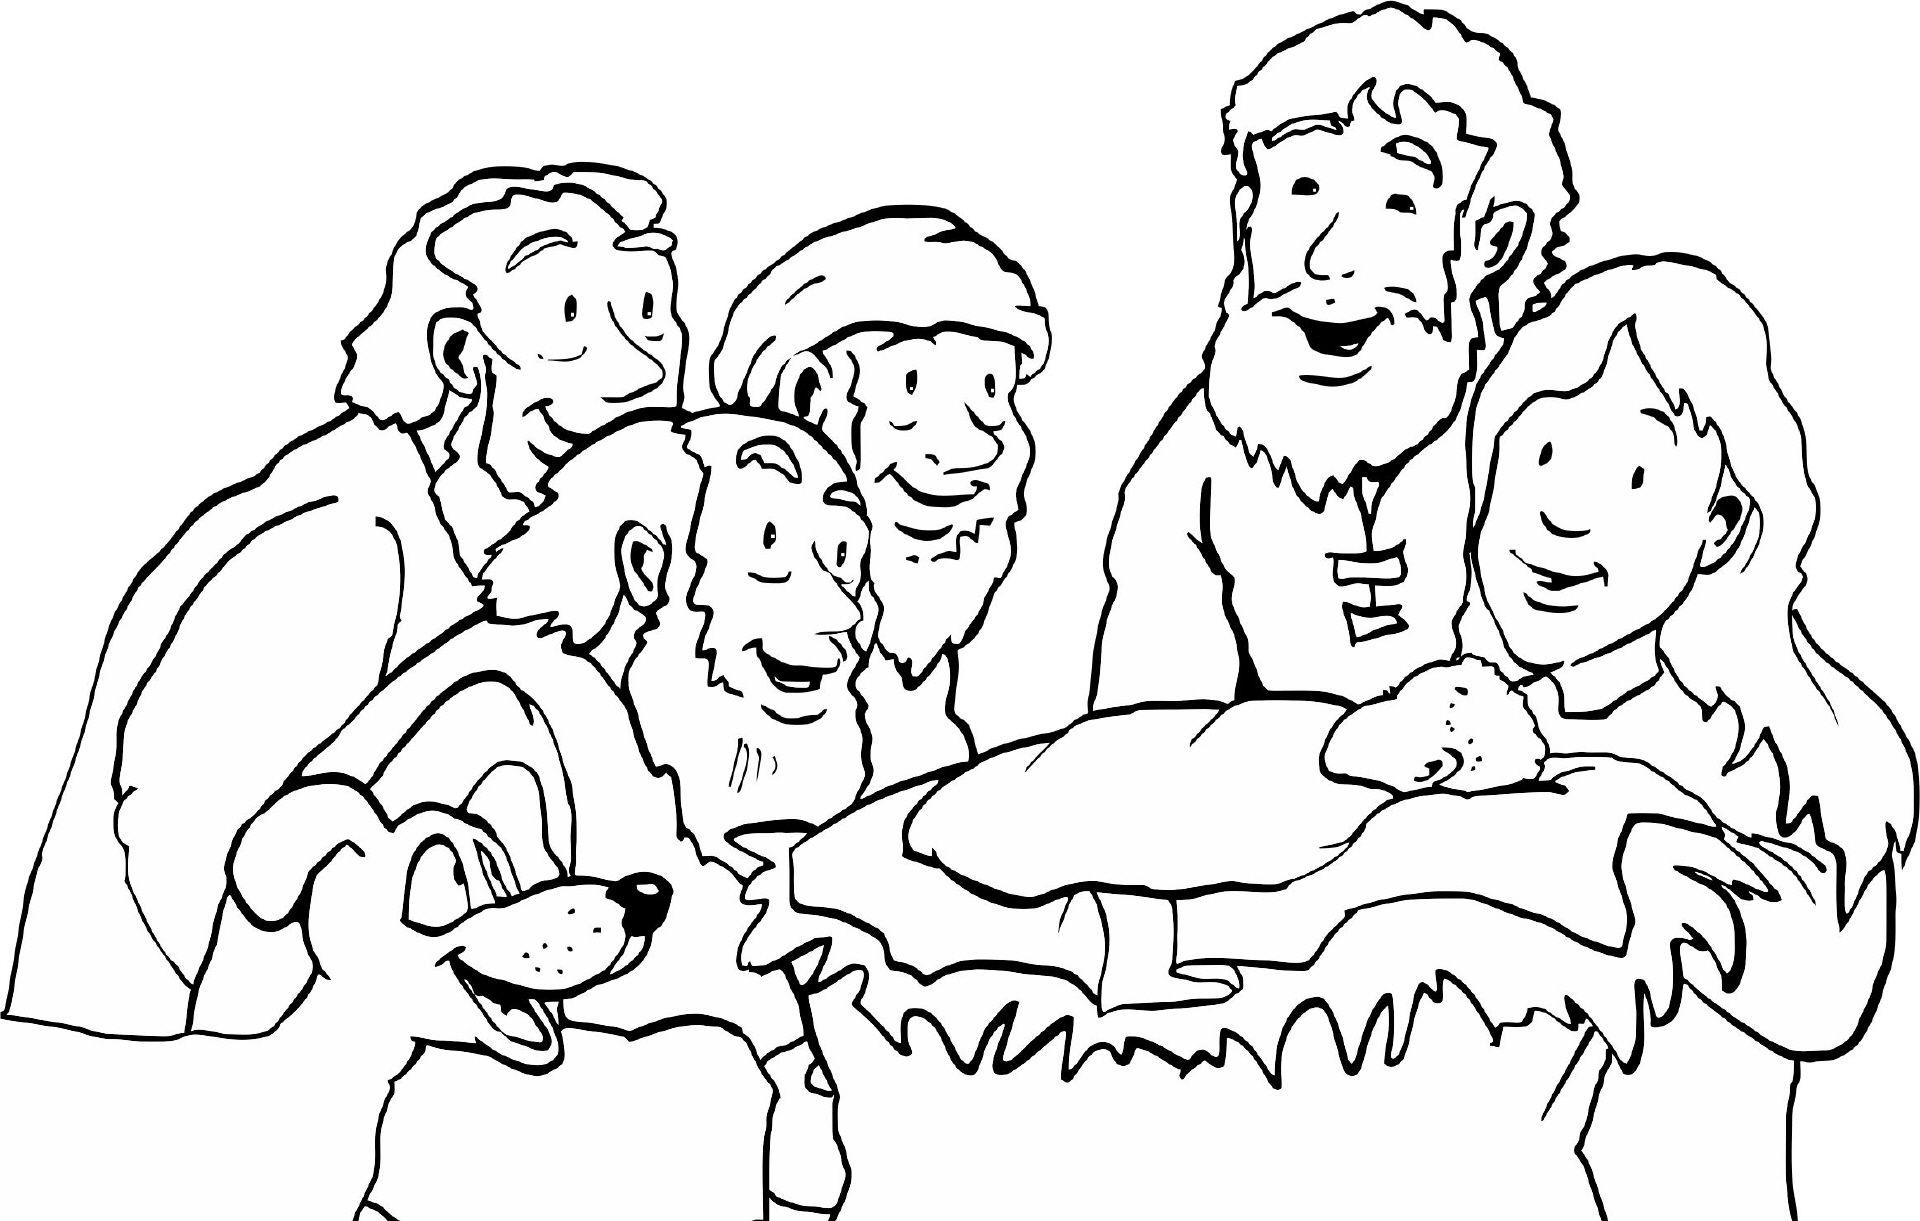 Weihnachten mjt Hirten | Ausmalbilder biblisch | Pinterest | Hirte ...